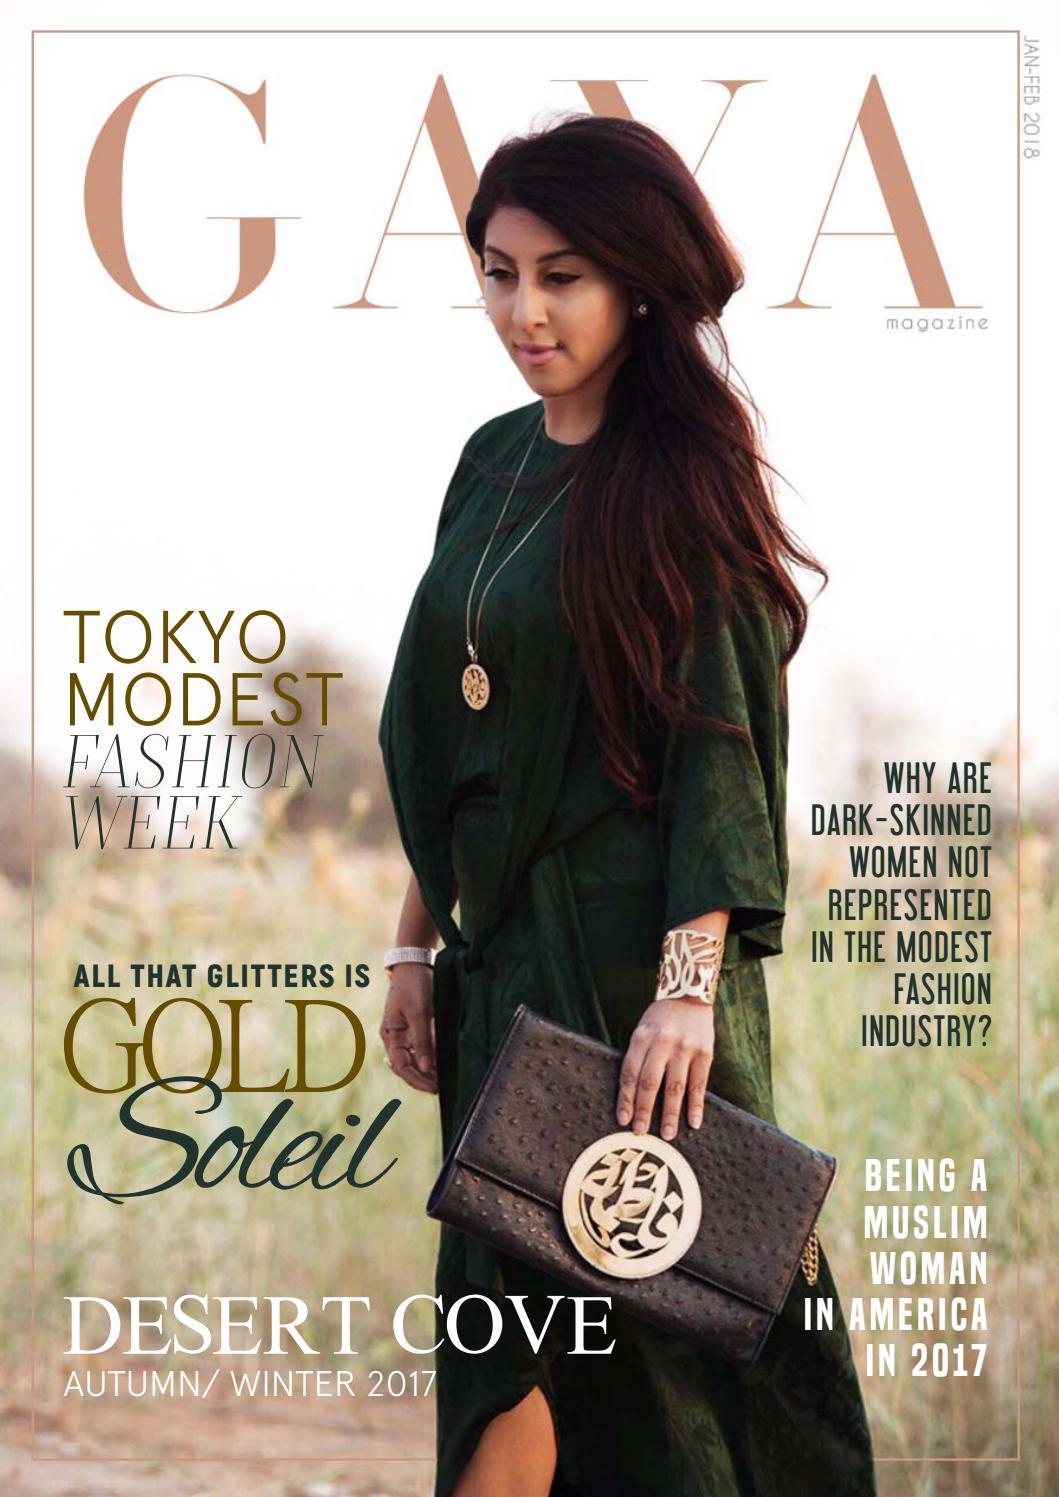 f7e53decd4b GAYA Magazine January 2018 - Hijab   Modest Fashion for today s Muslim  woman by GAYA Magazine - issuu